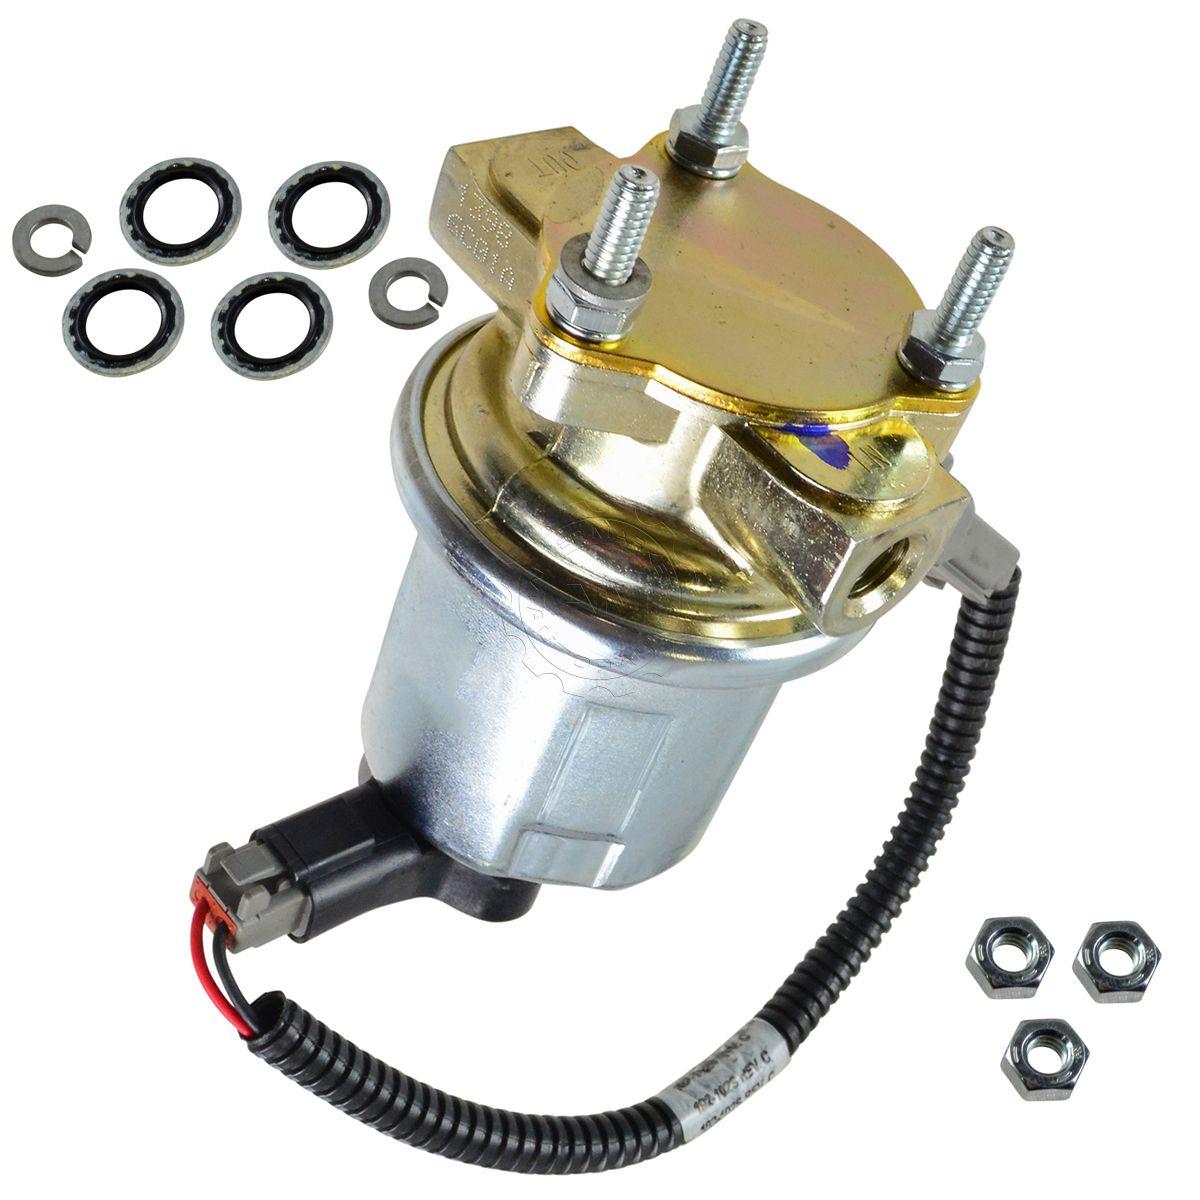 hight resolution of delphi hfp923 fuel lift pump for dodge ram 2500 3500 cummins 5 9l turbo diesel